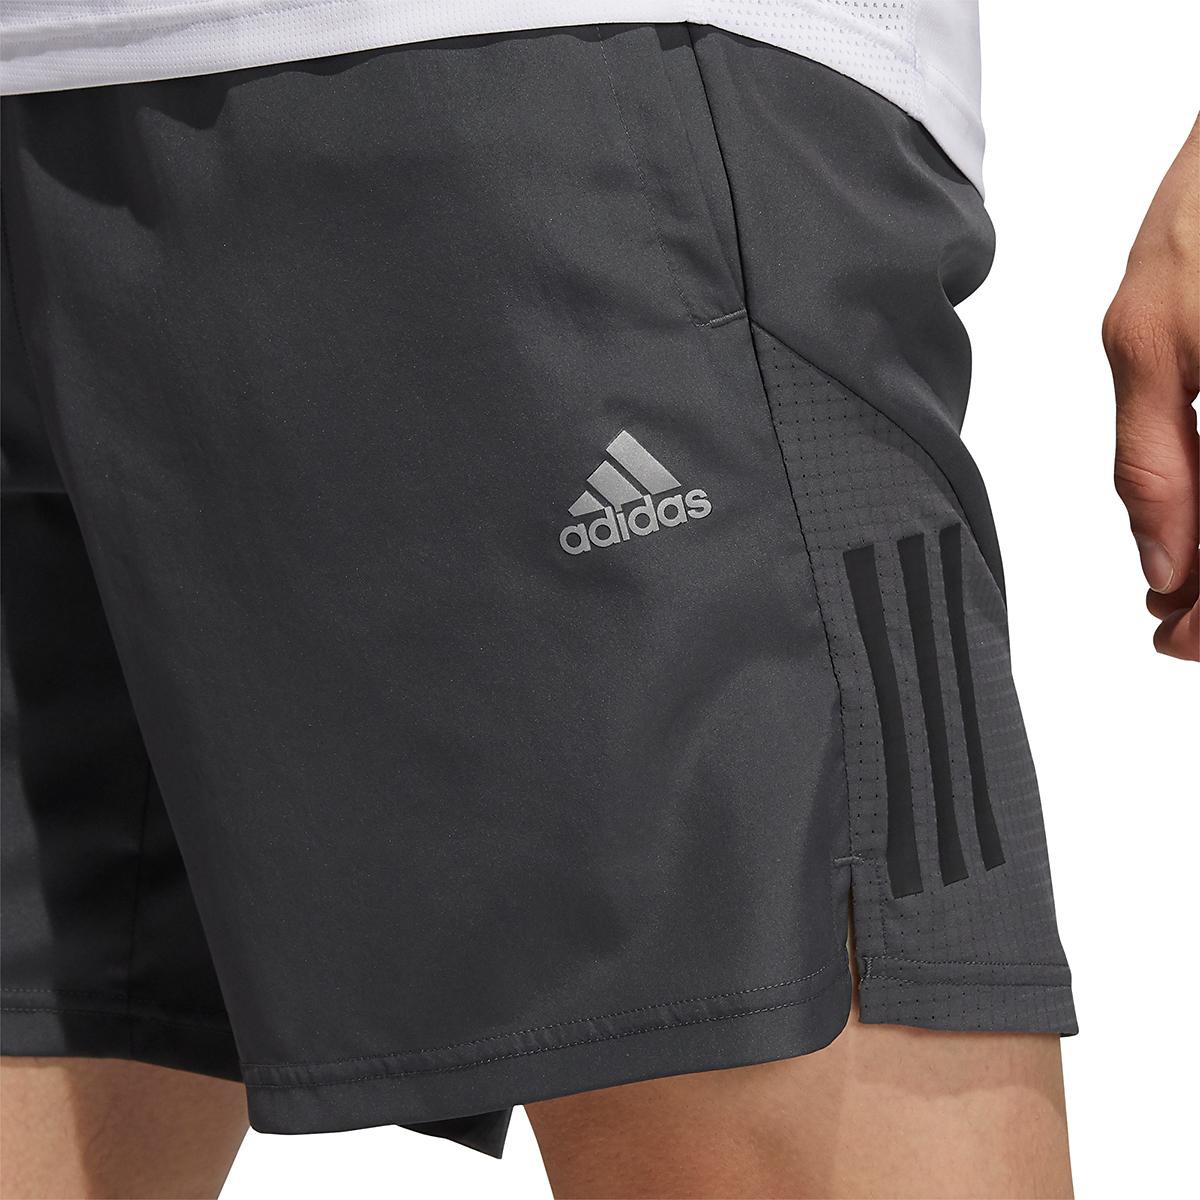 Men's Adidas Own The Run Shorts, , large, image 4